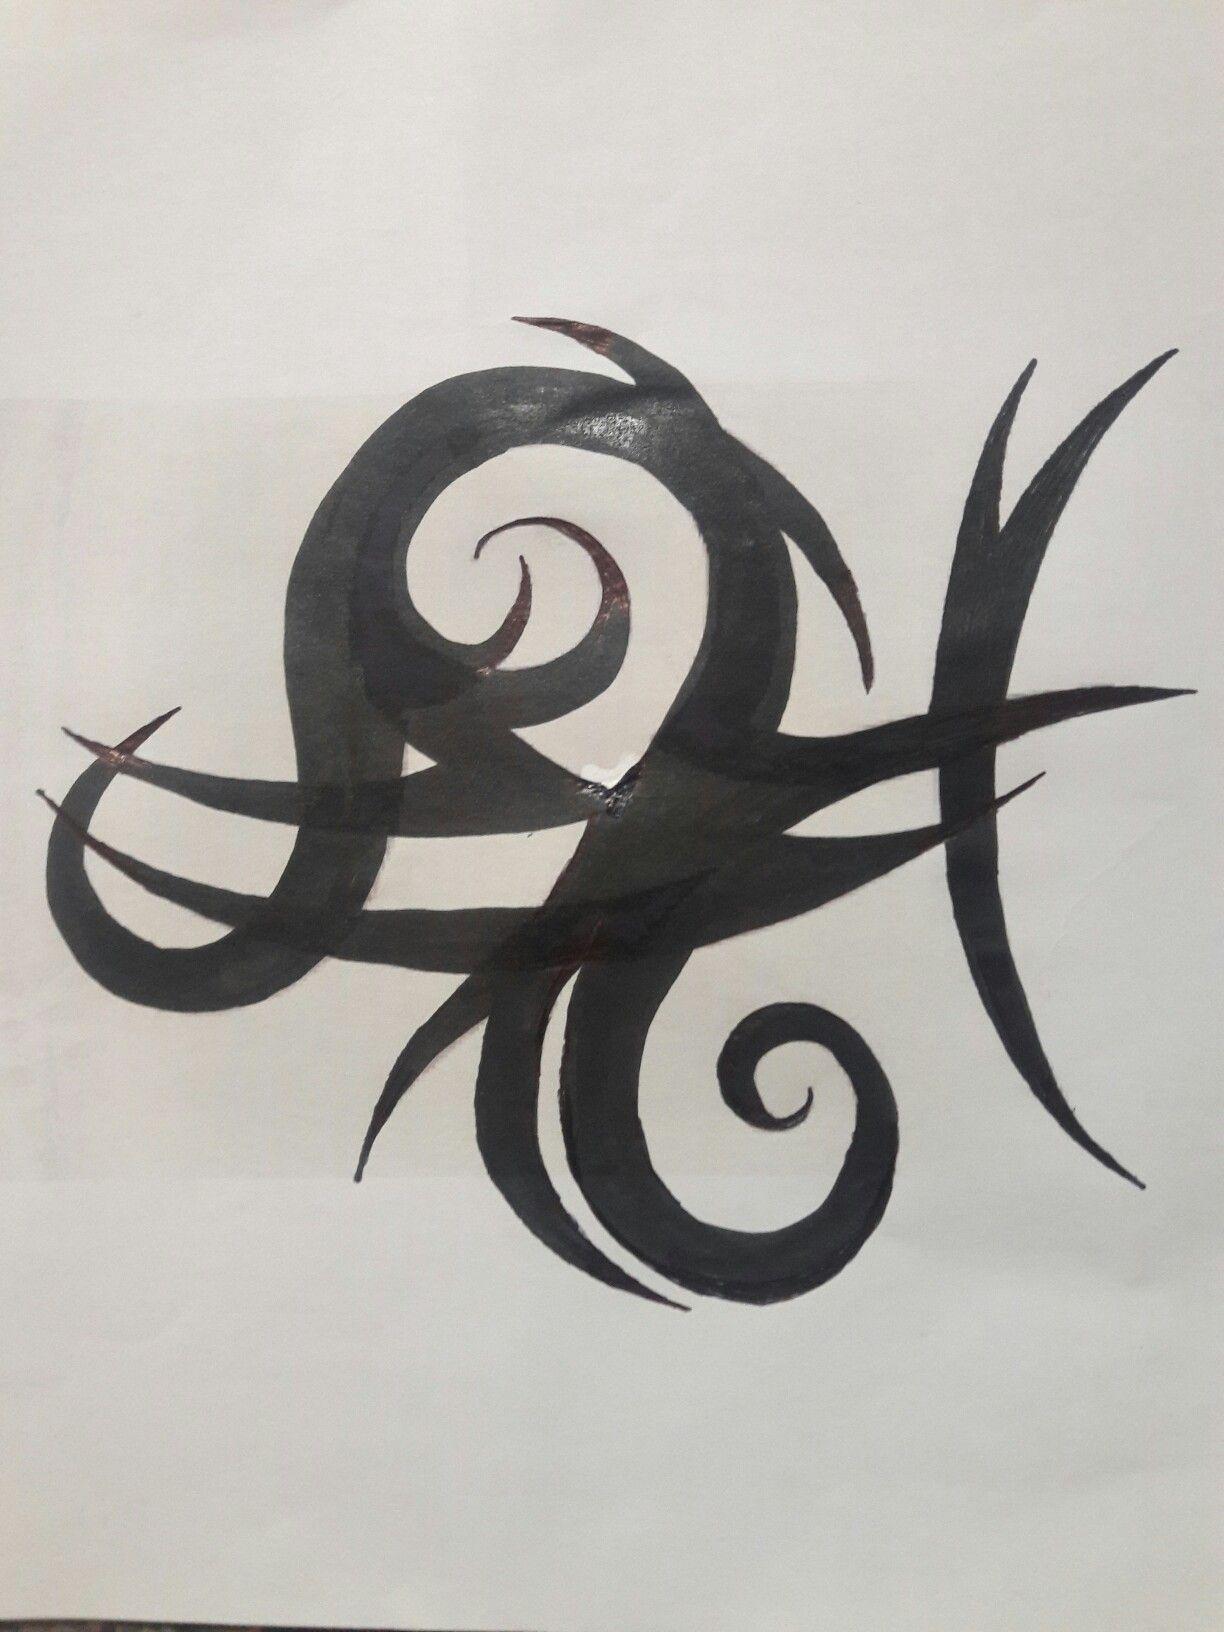 Leo Libra Tattoo : libra, tattoo, Libra, Tribal, Tattoo, Design, Tattoo,, Designs,, Tattoos